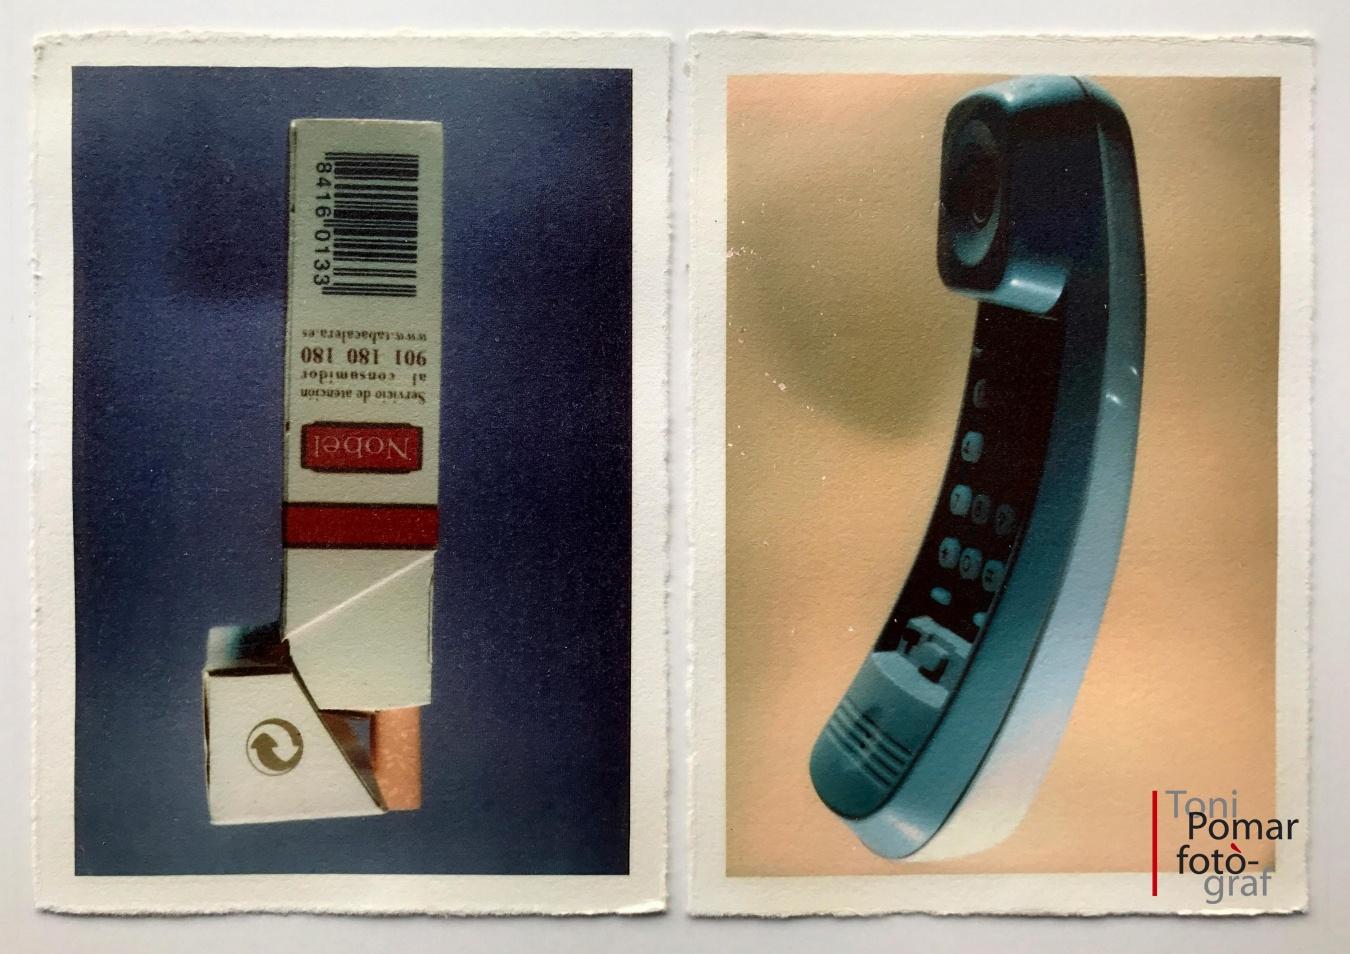 J - Paquet de tabac | j - Telèfon - Alfabet - Toni Pomar. Alfabet